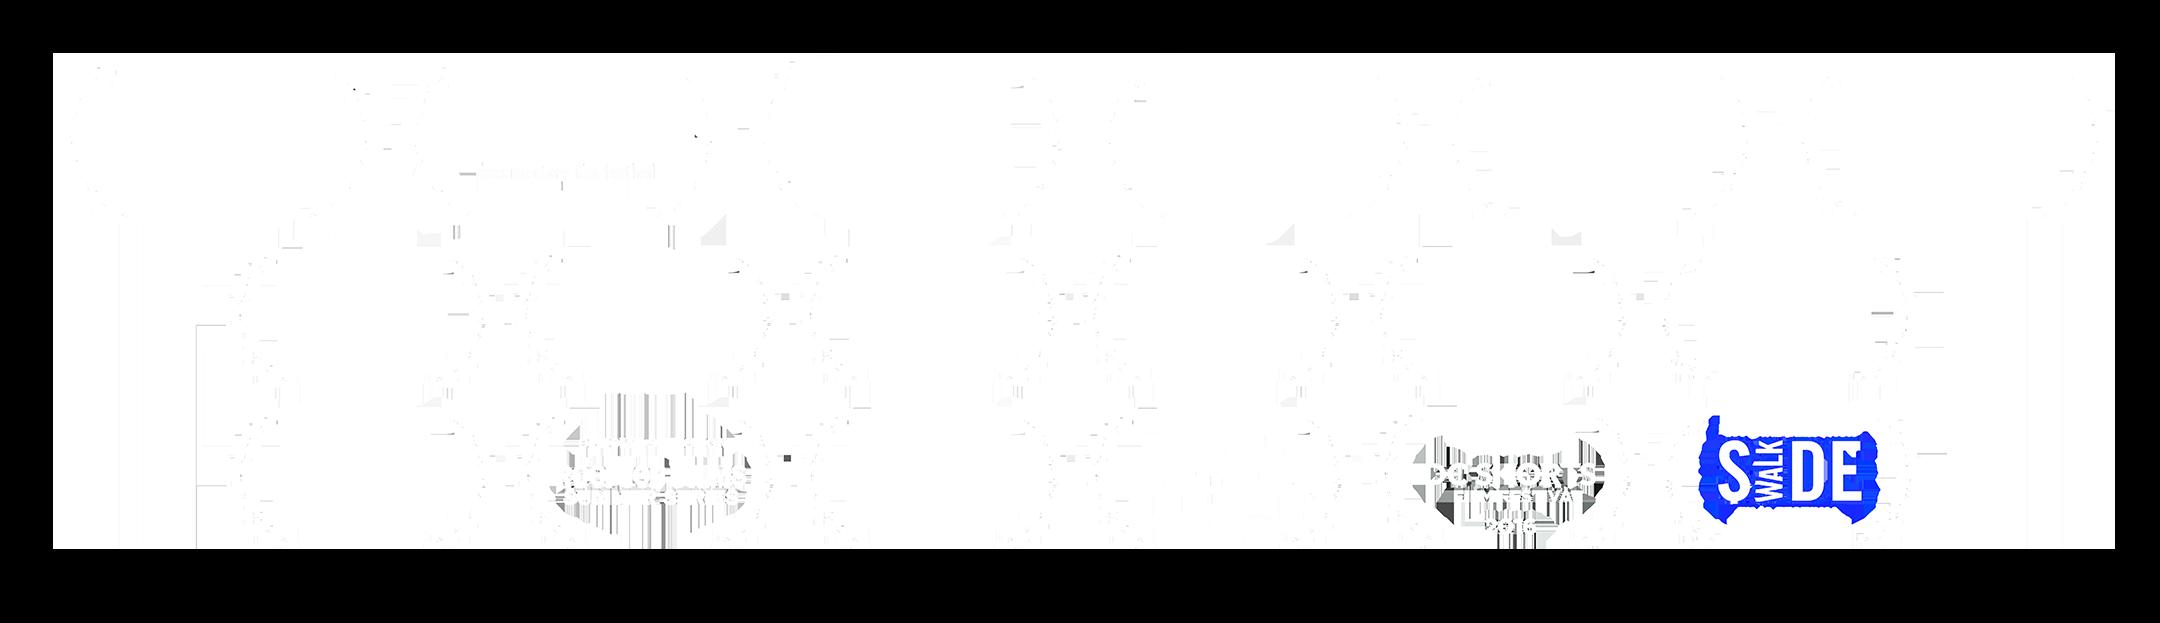 Award winning rescue pet film